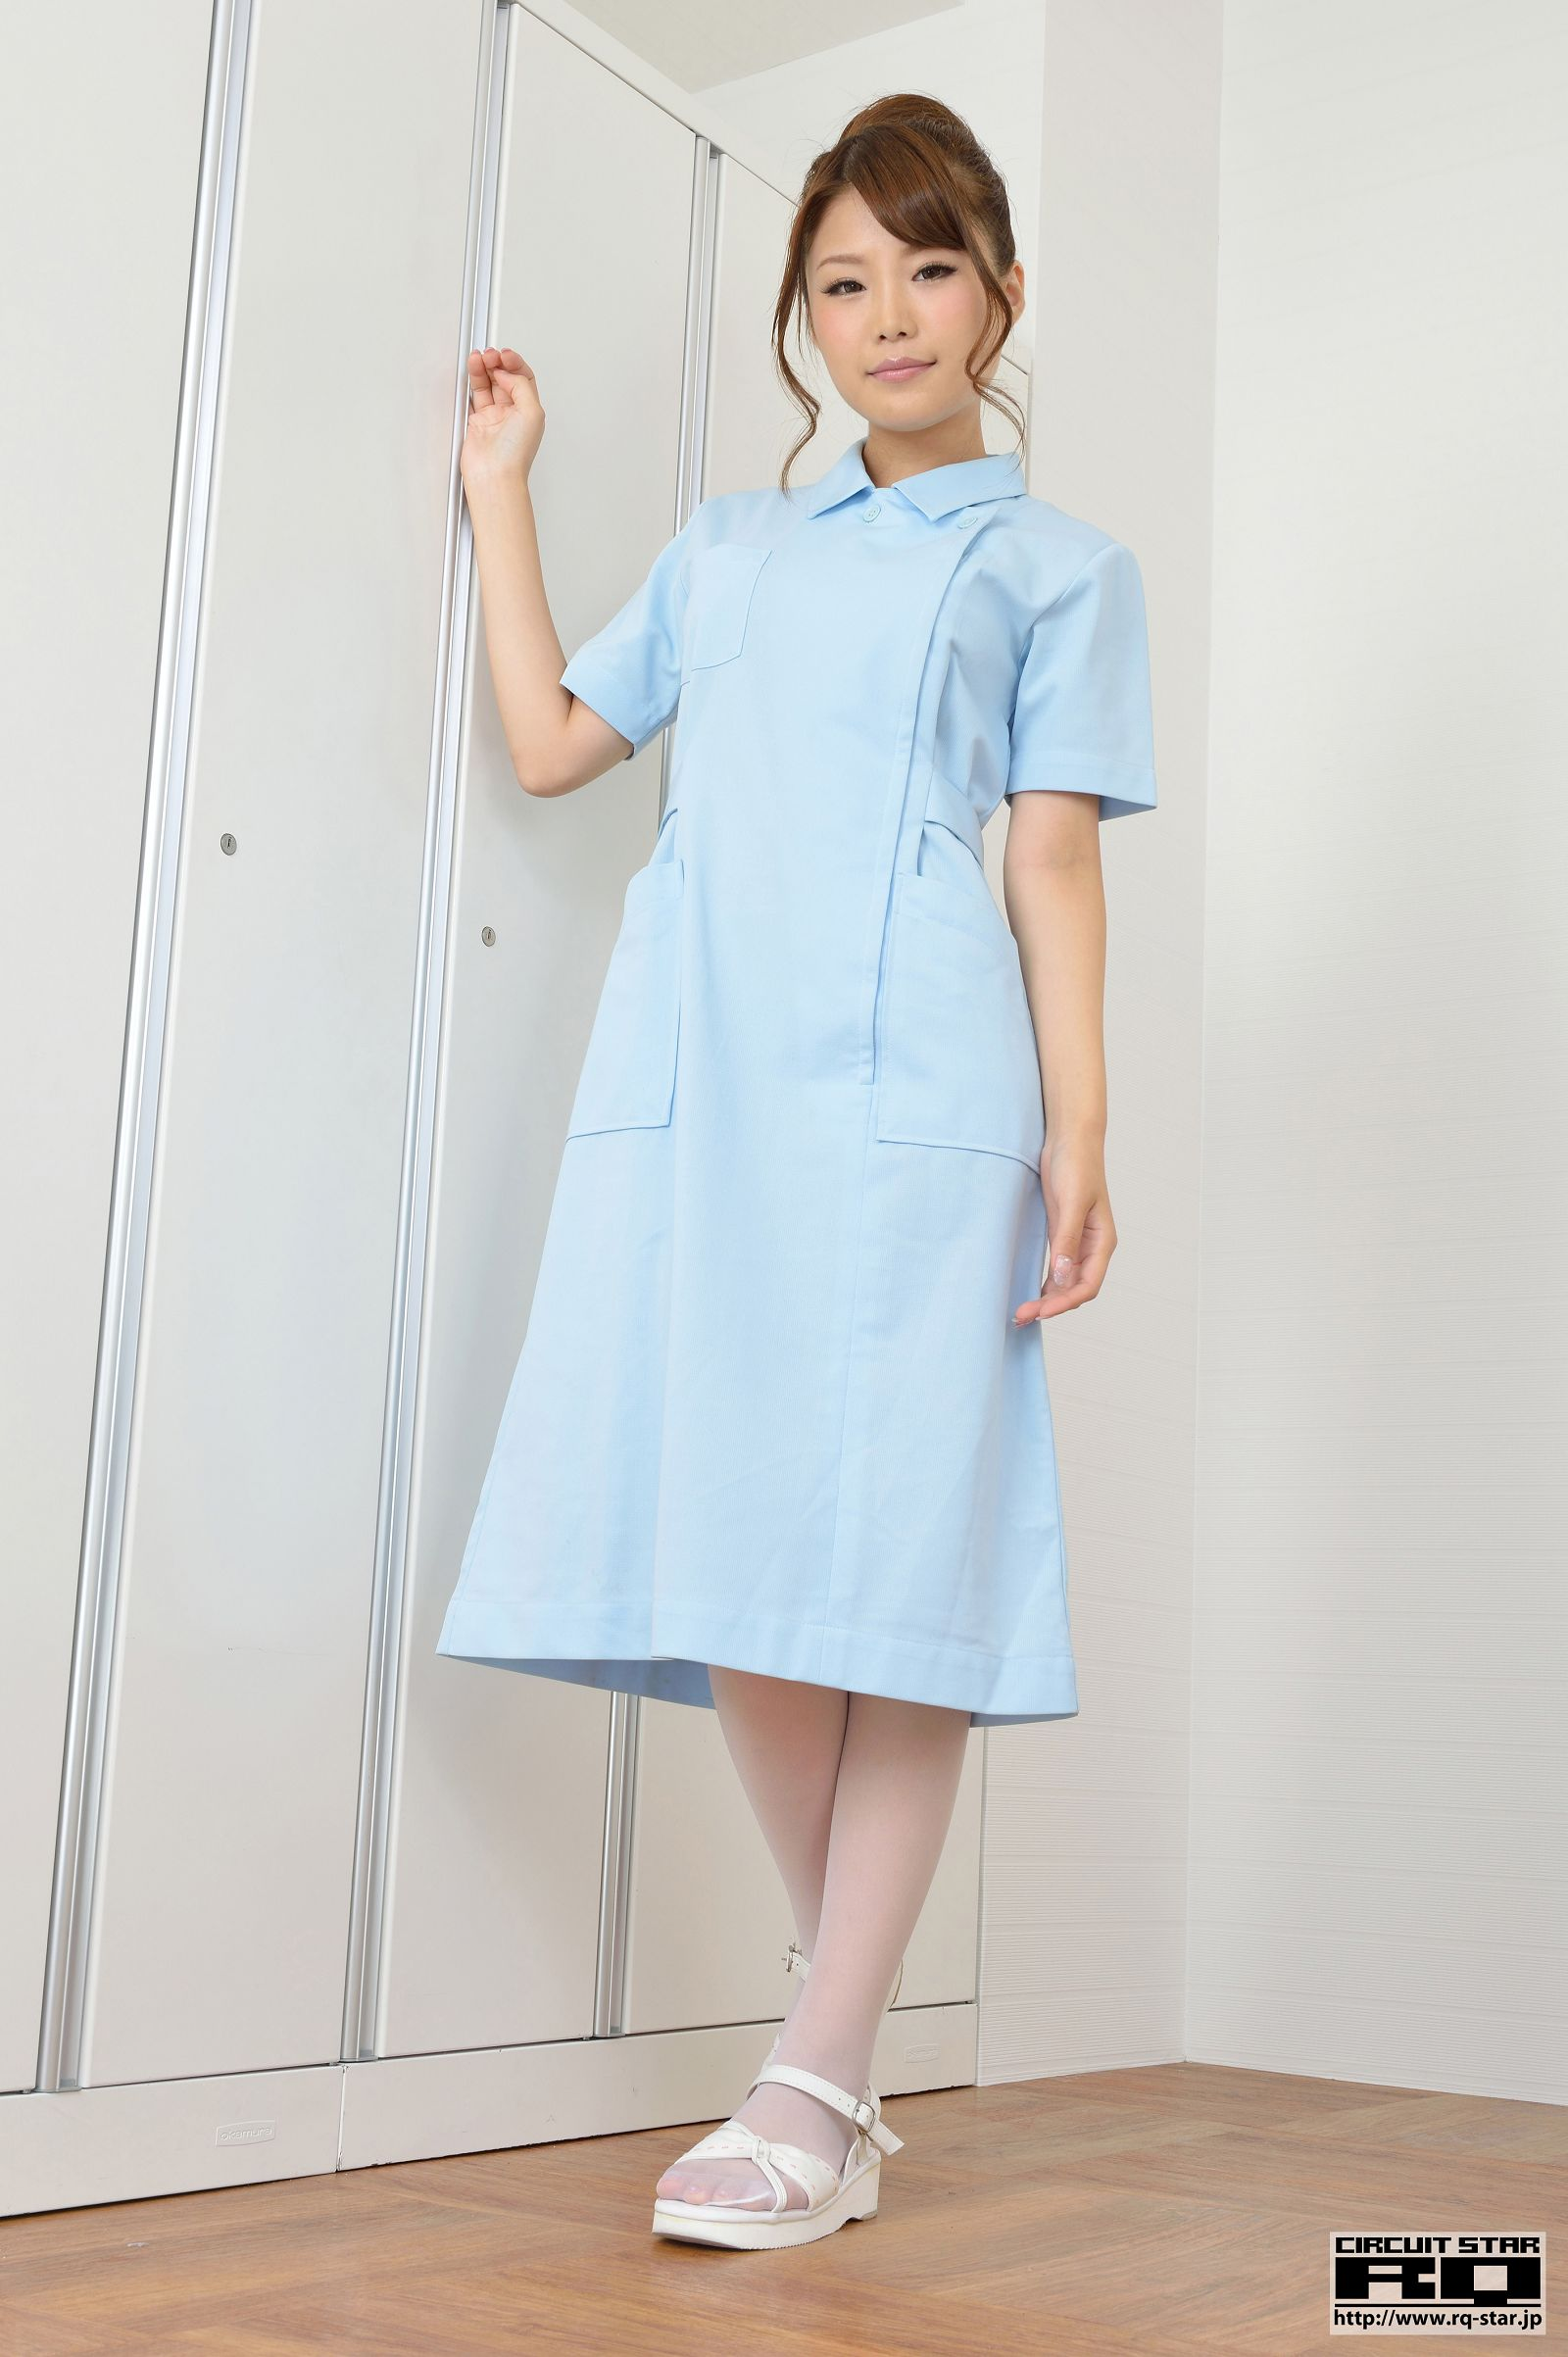 [RQ STAR美女] NO.00745 Nanako Mizuno 水野菜々子 Nurse Style[75P] RQ STAR 第1张